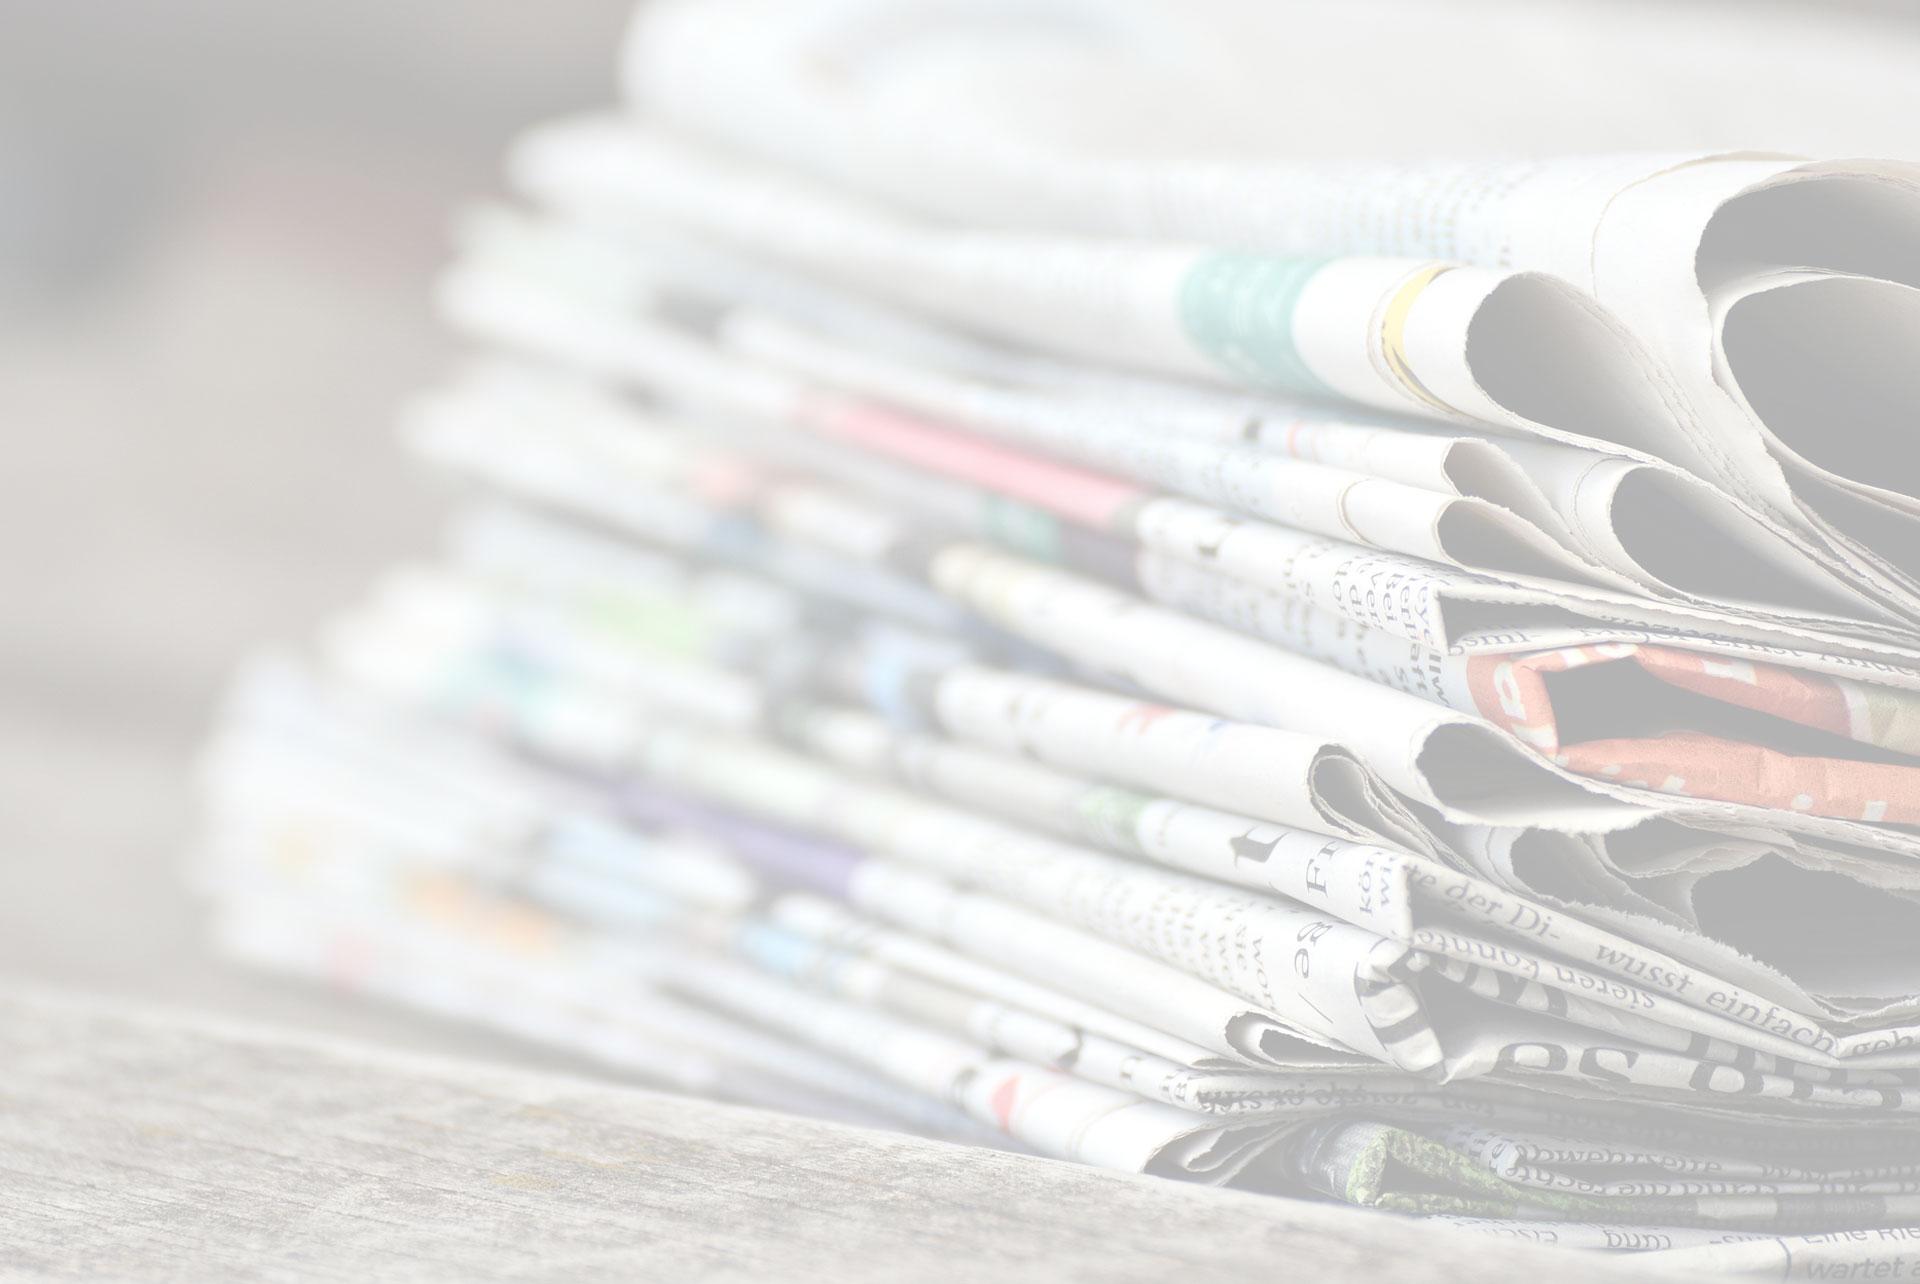 Fastwevb